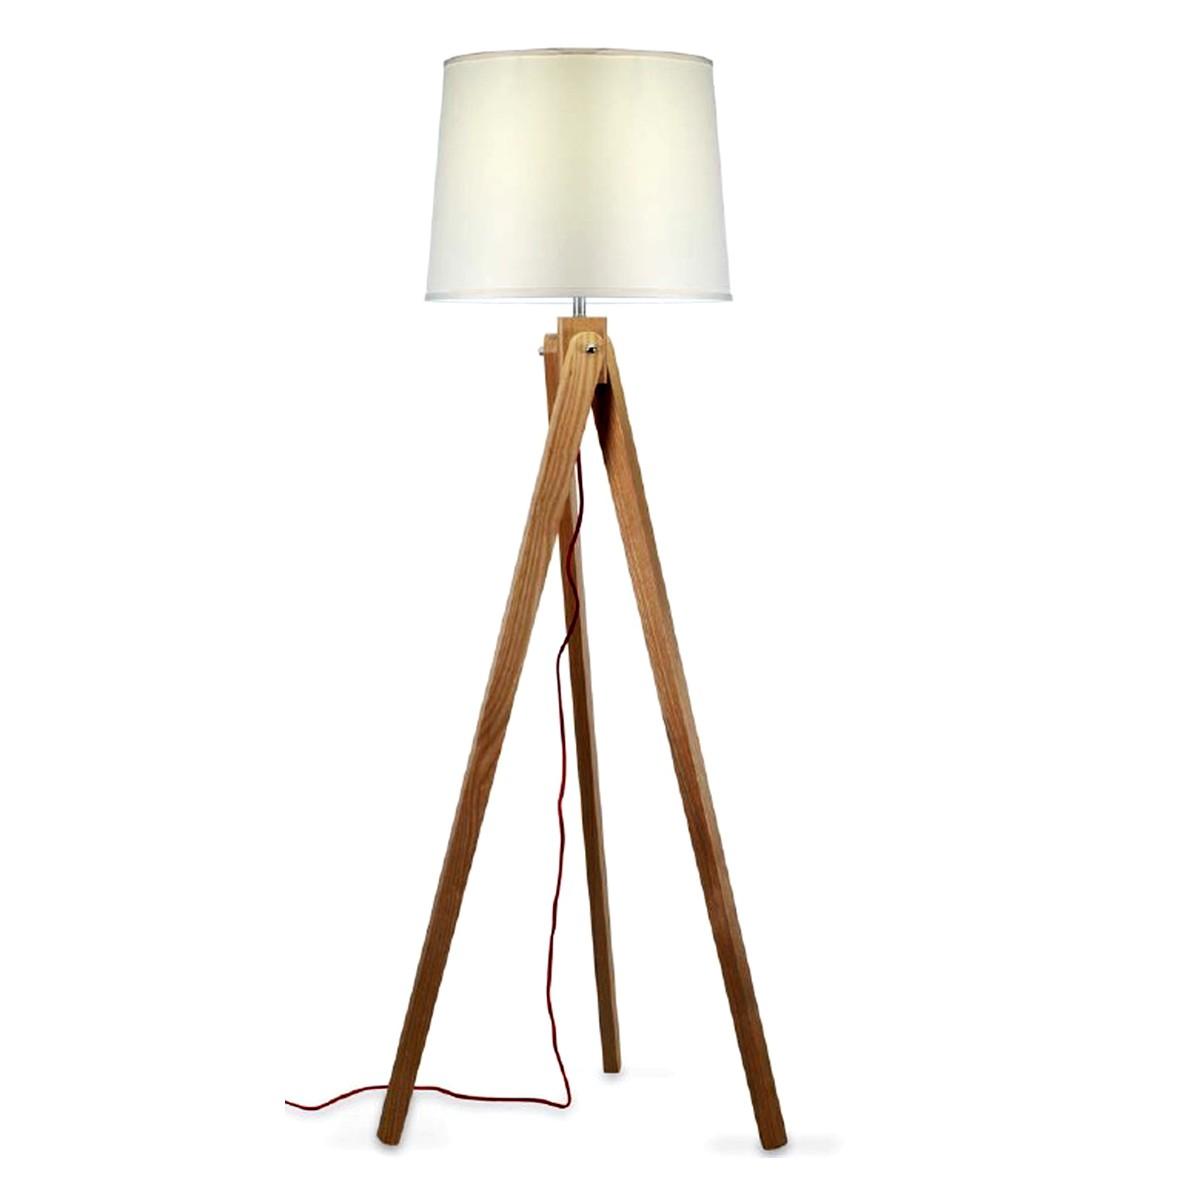 Lampade da terra ikea lampada da terra per illuminare e - Lampade da muro ikea ...